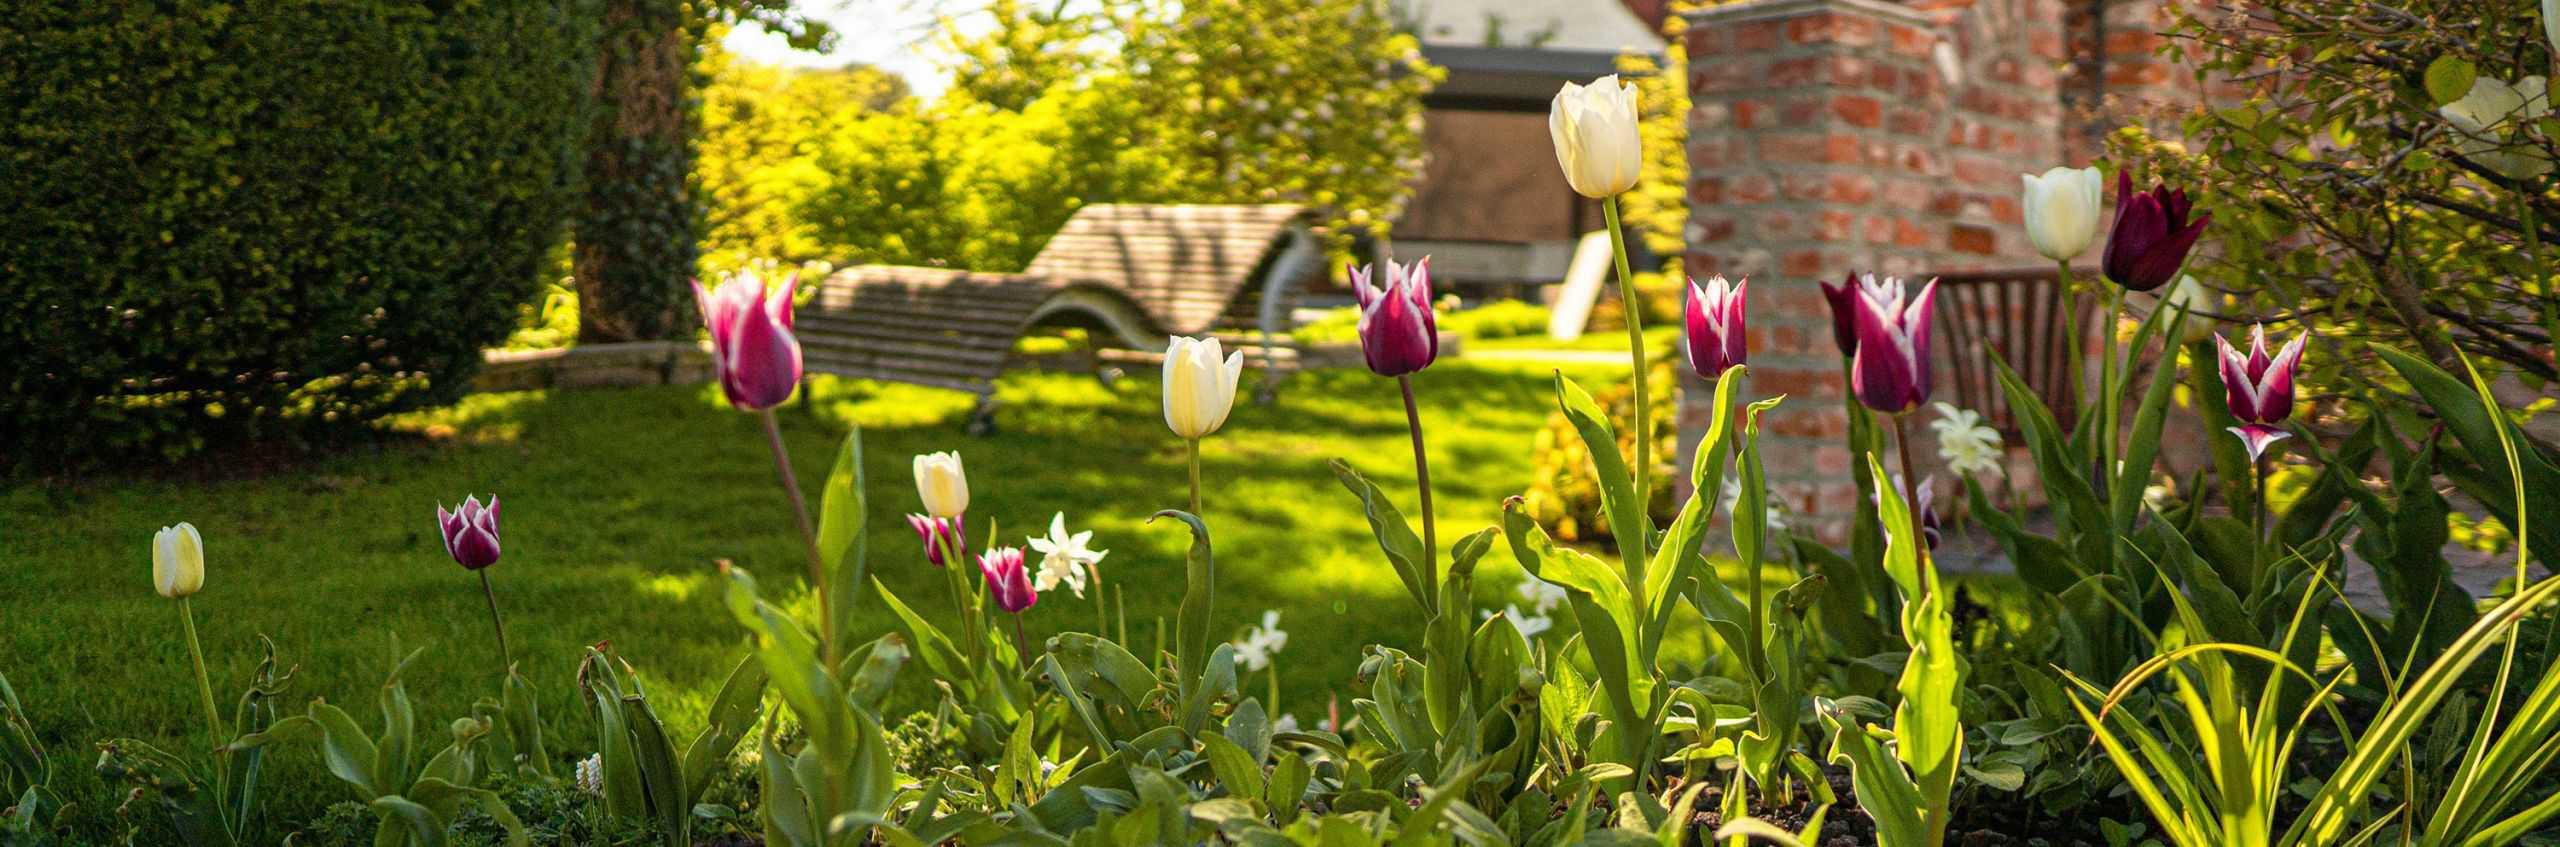 Bepflanzung Garten Mit Tulpen Bullinger